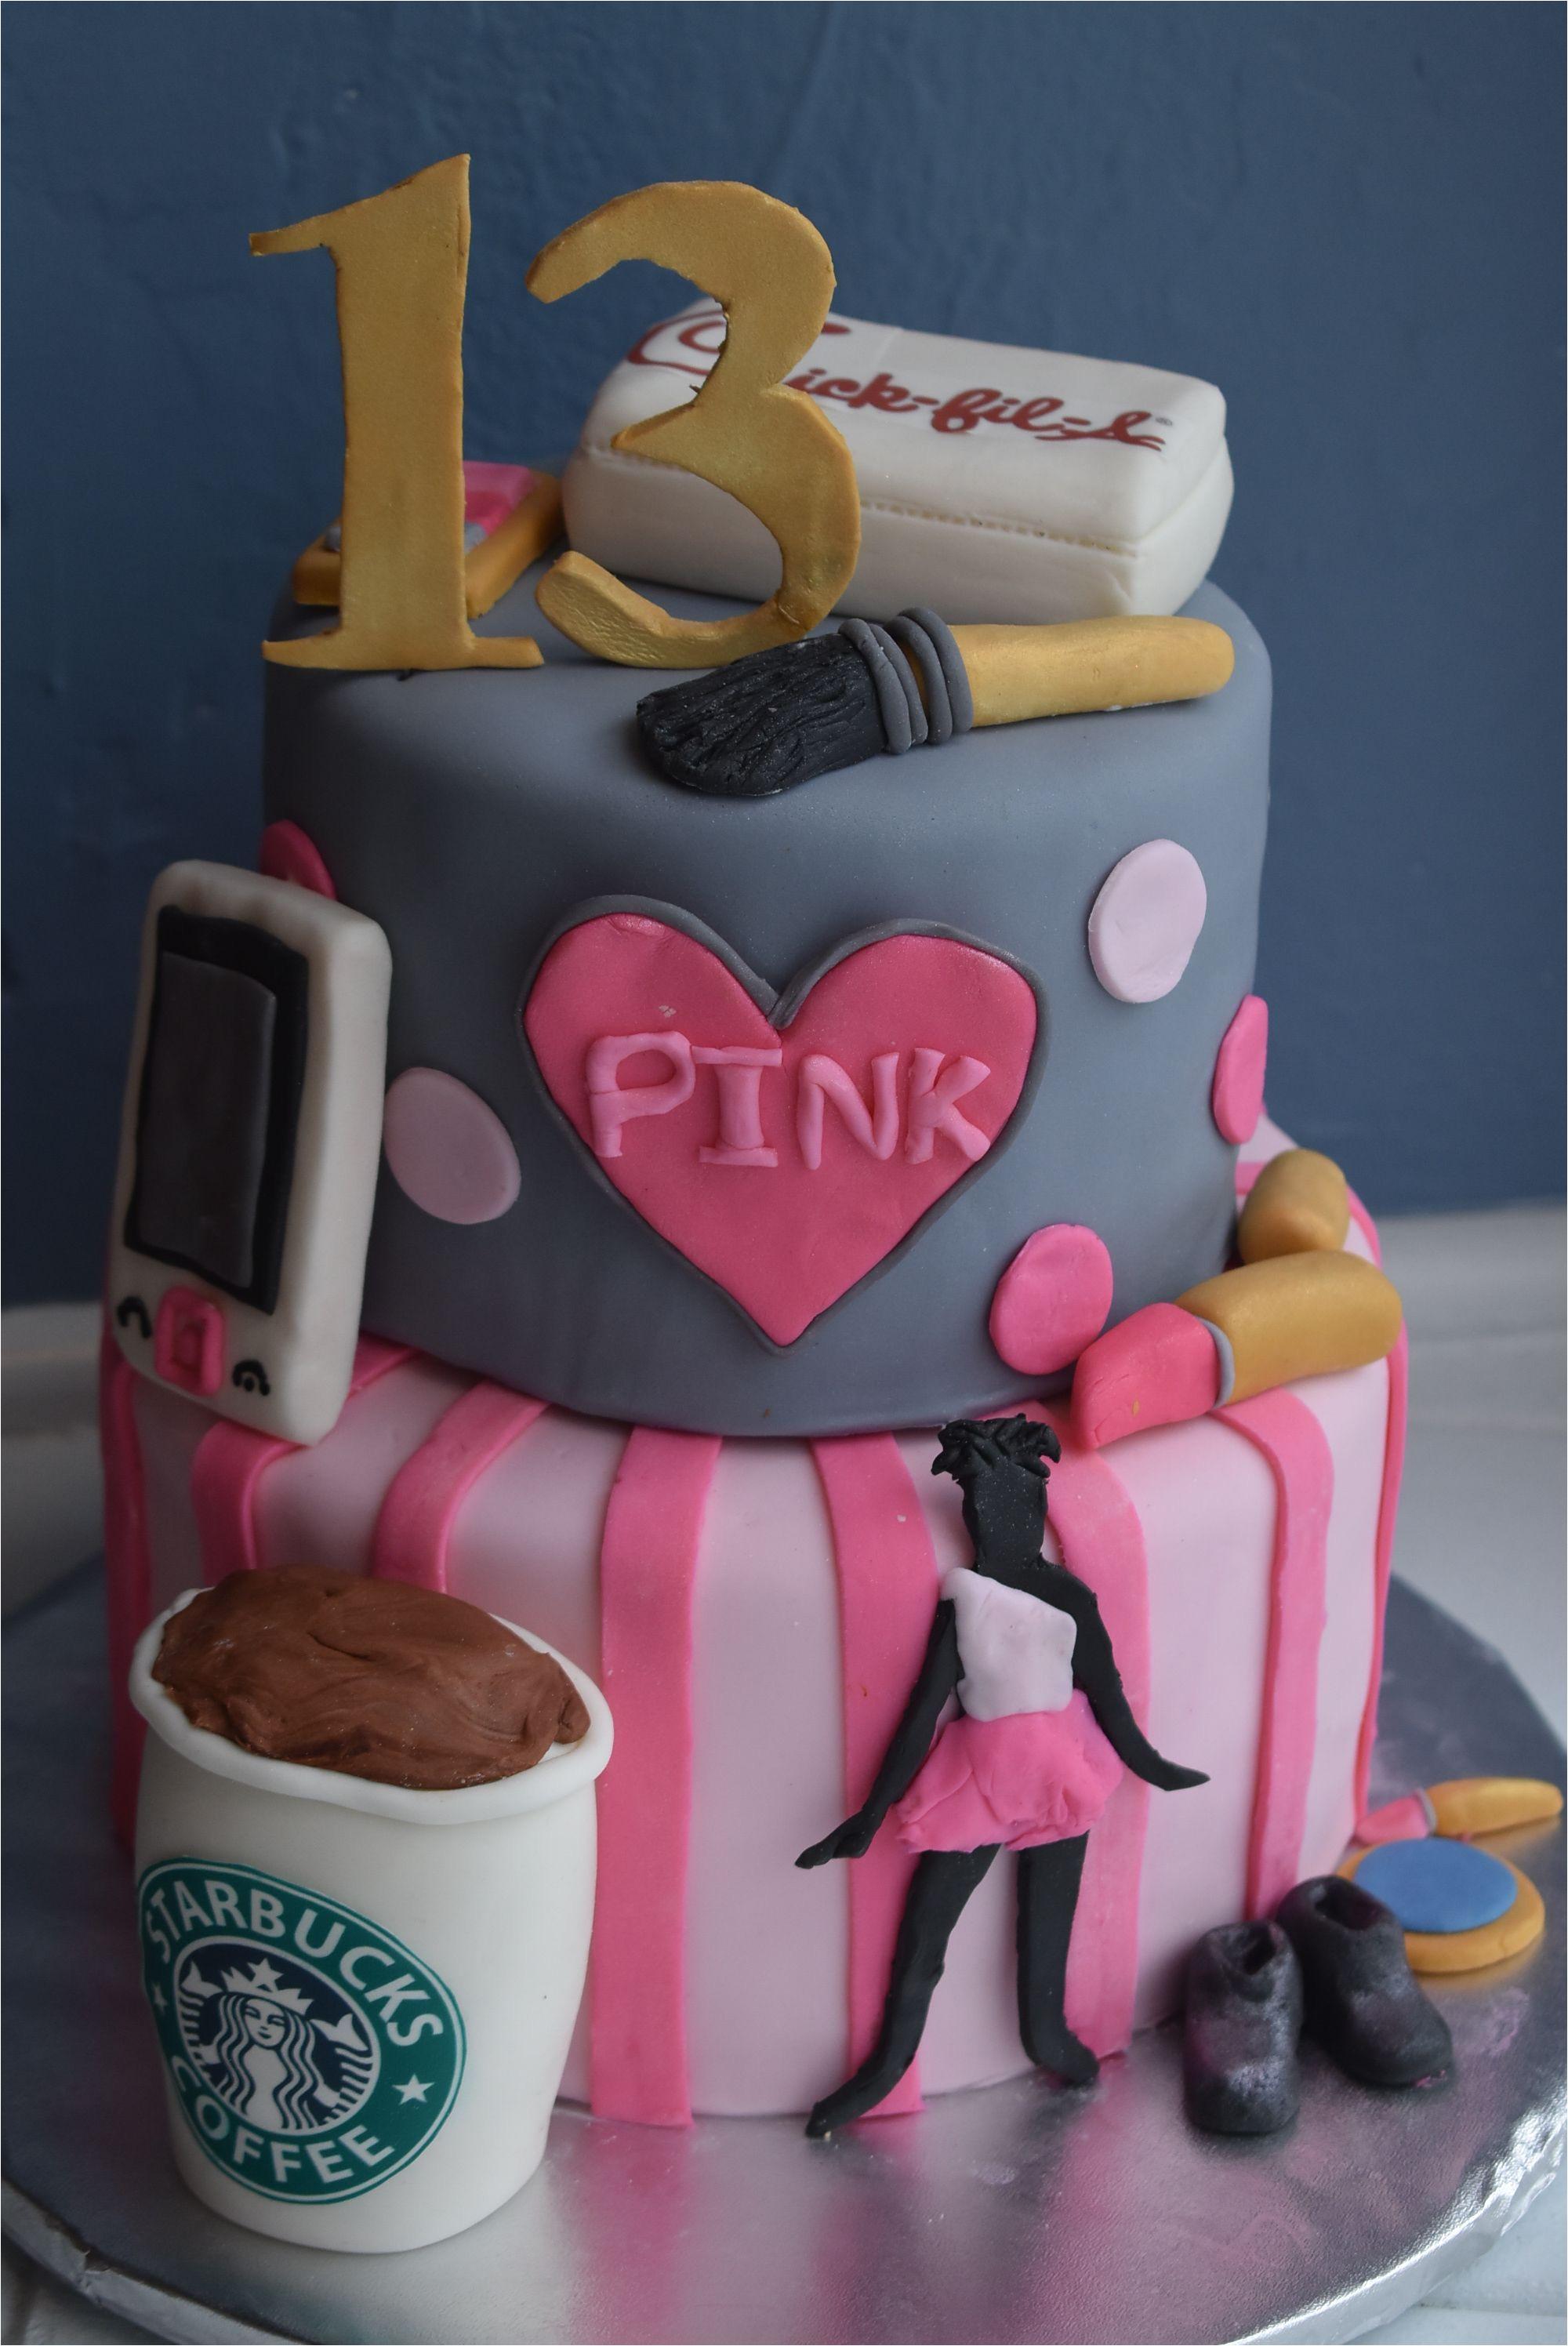 13 birthday cake with starbucks chickfila pink dance and makeup roanoke va willow pond bakery